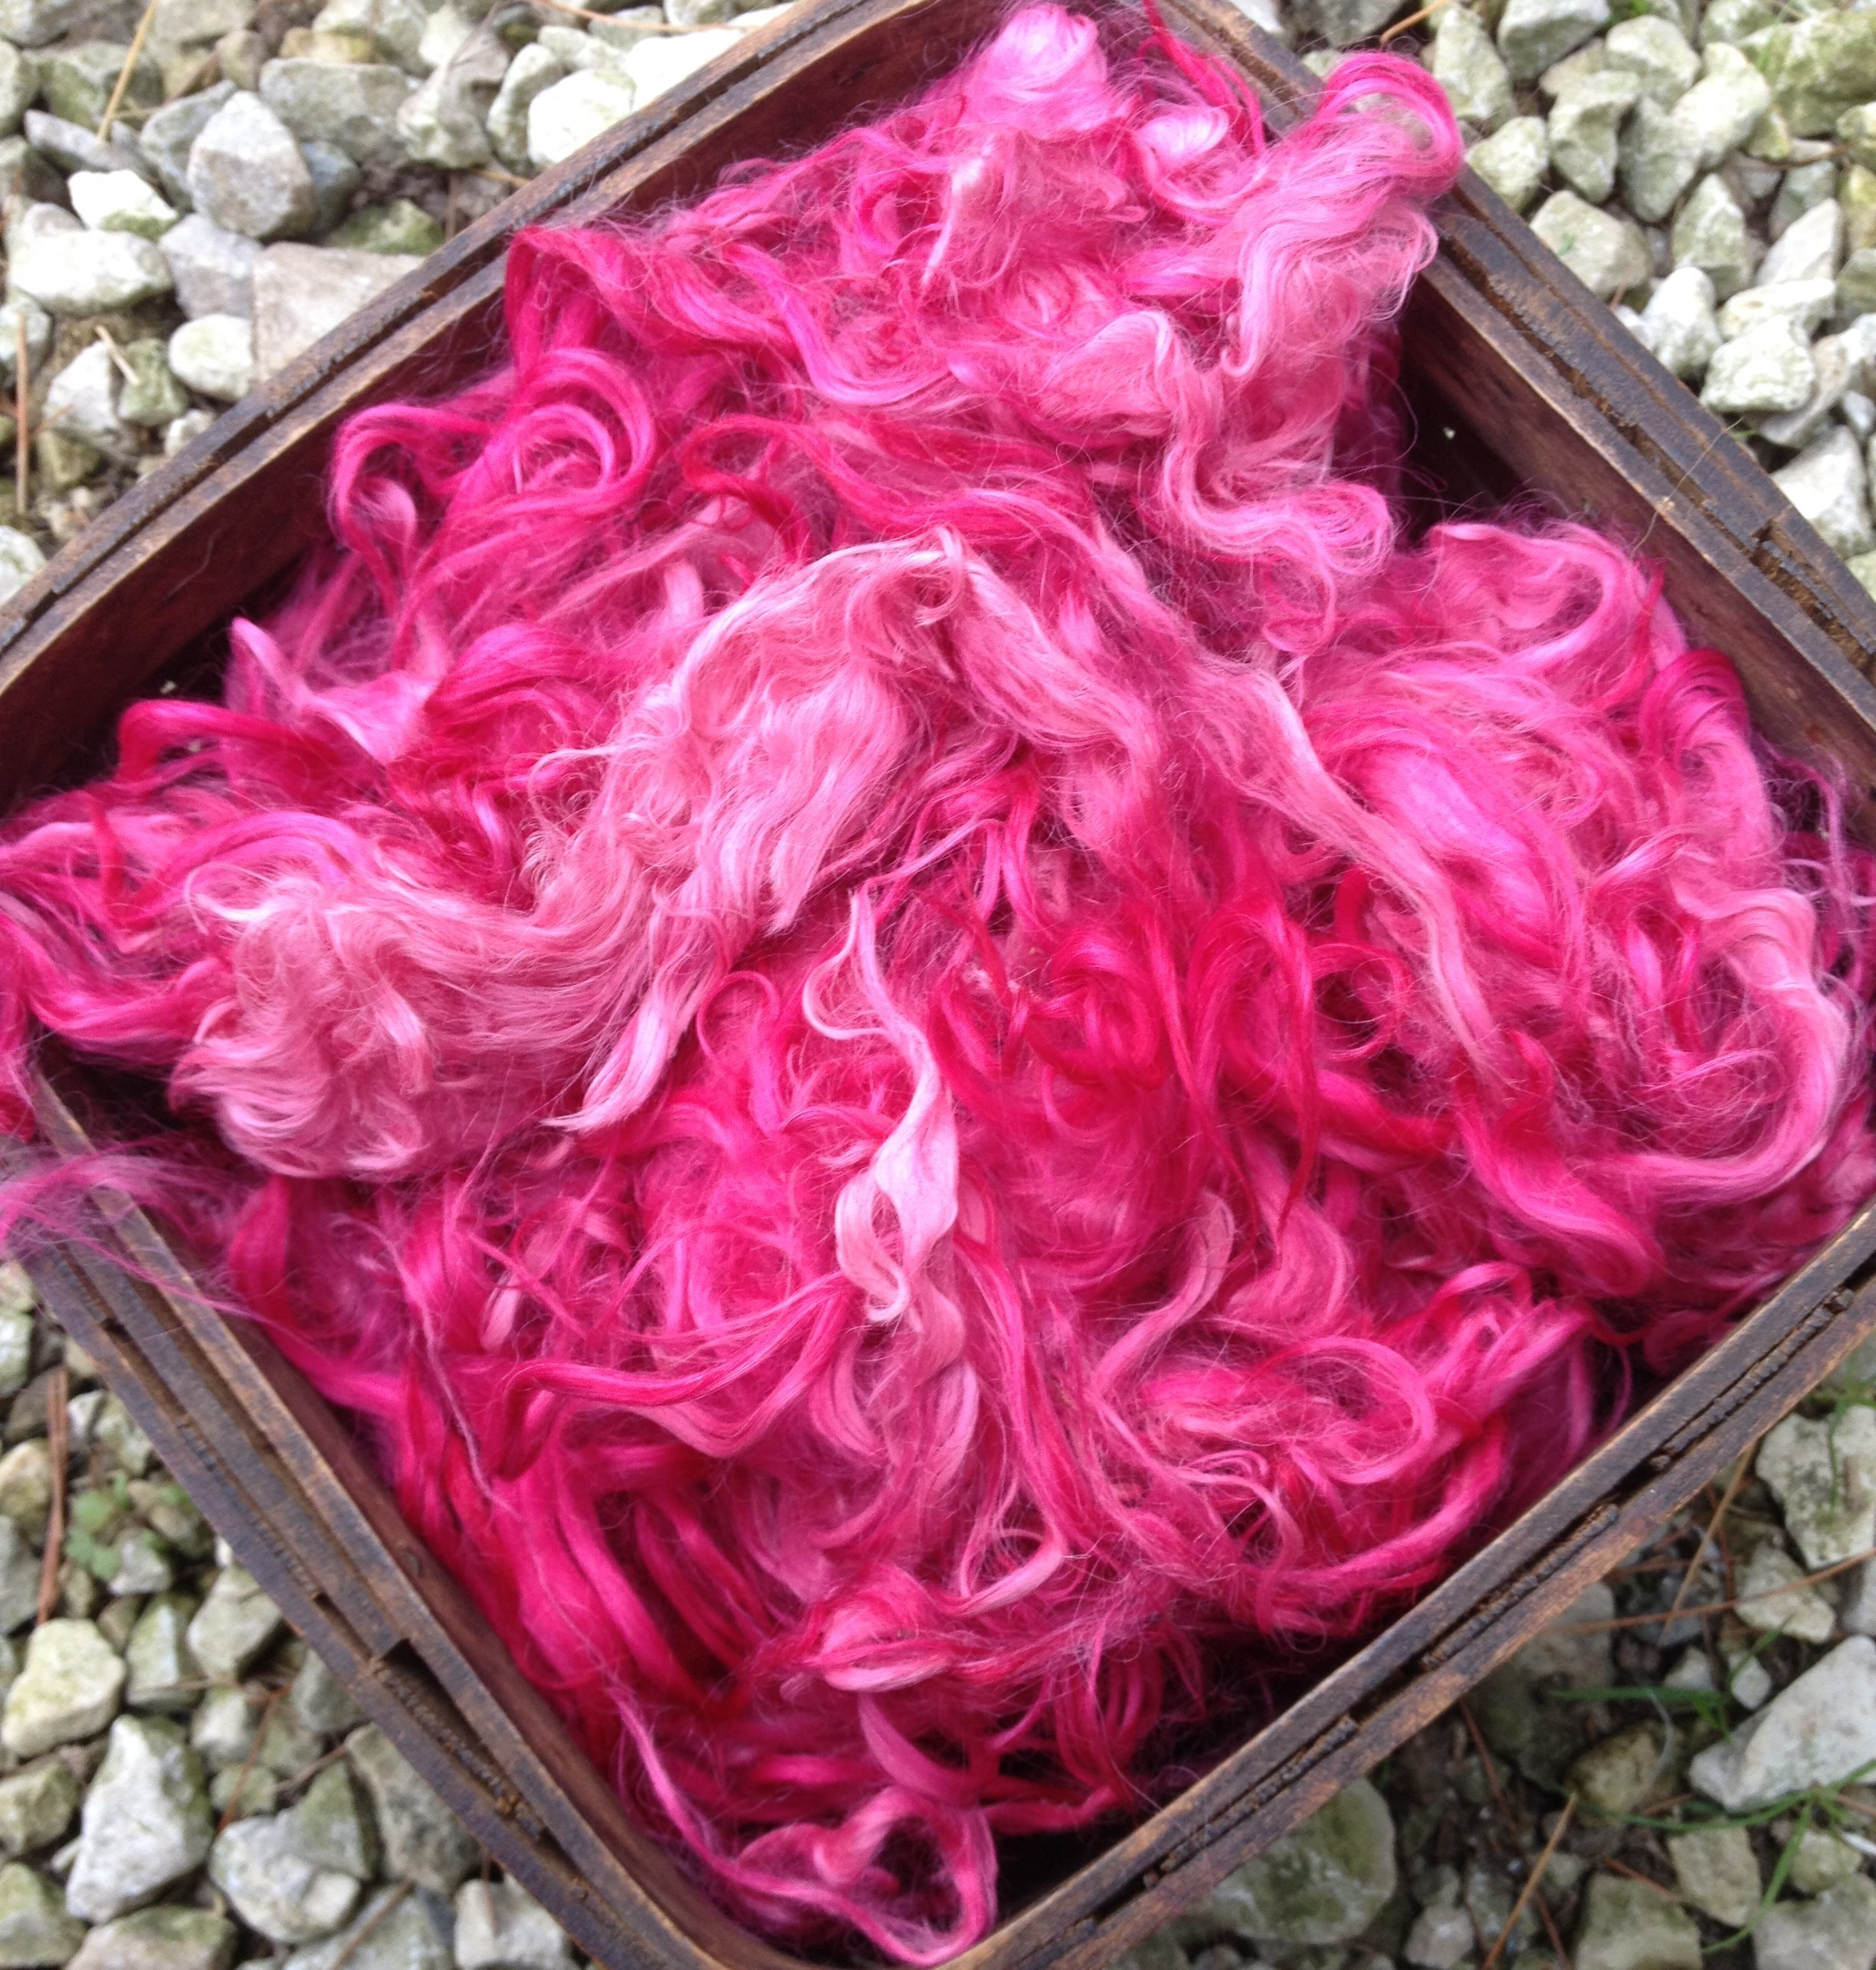 Hand-Dyed Suri Alpaca Fiber, 5.5 Inches, Orchid 17754